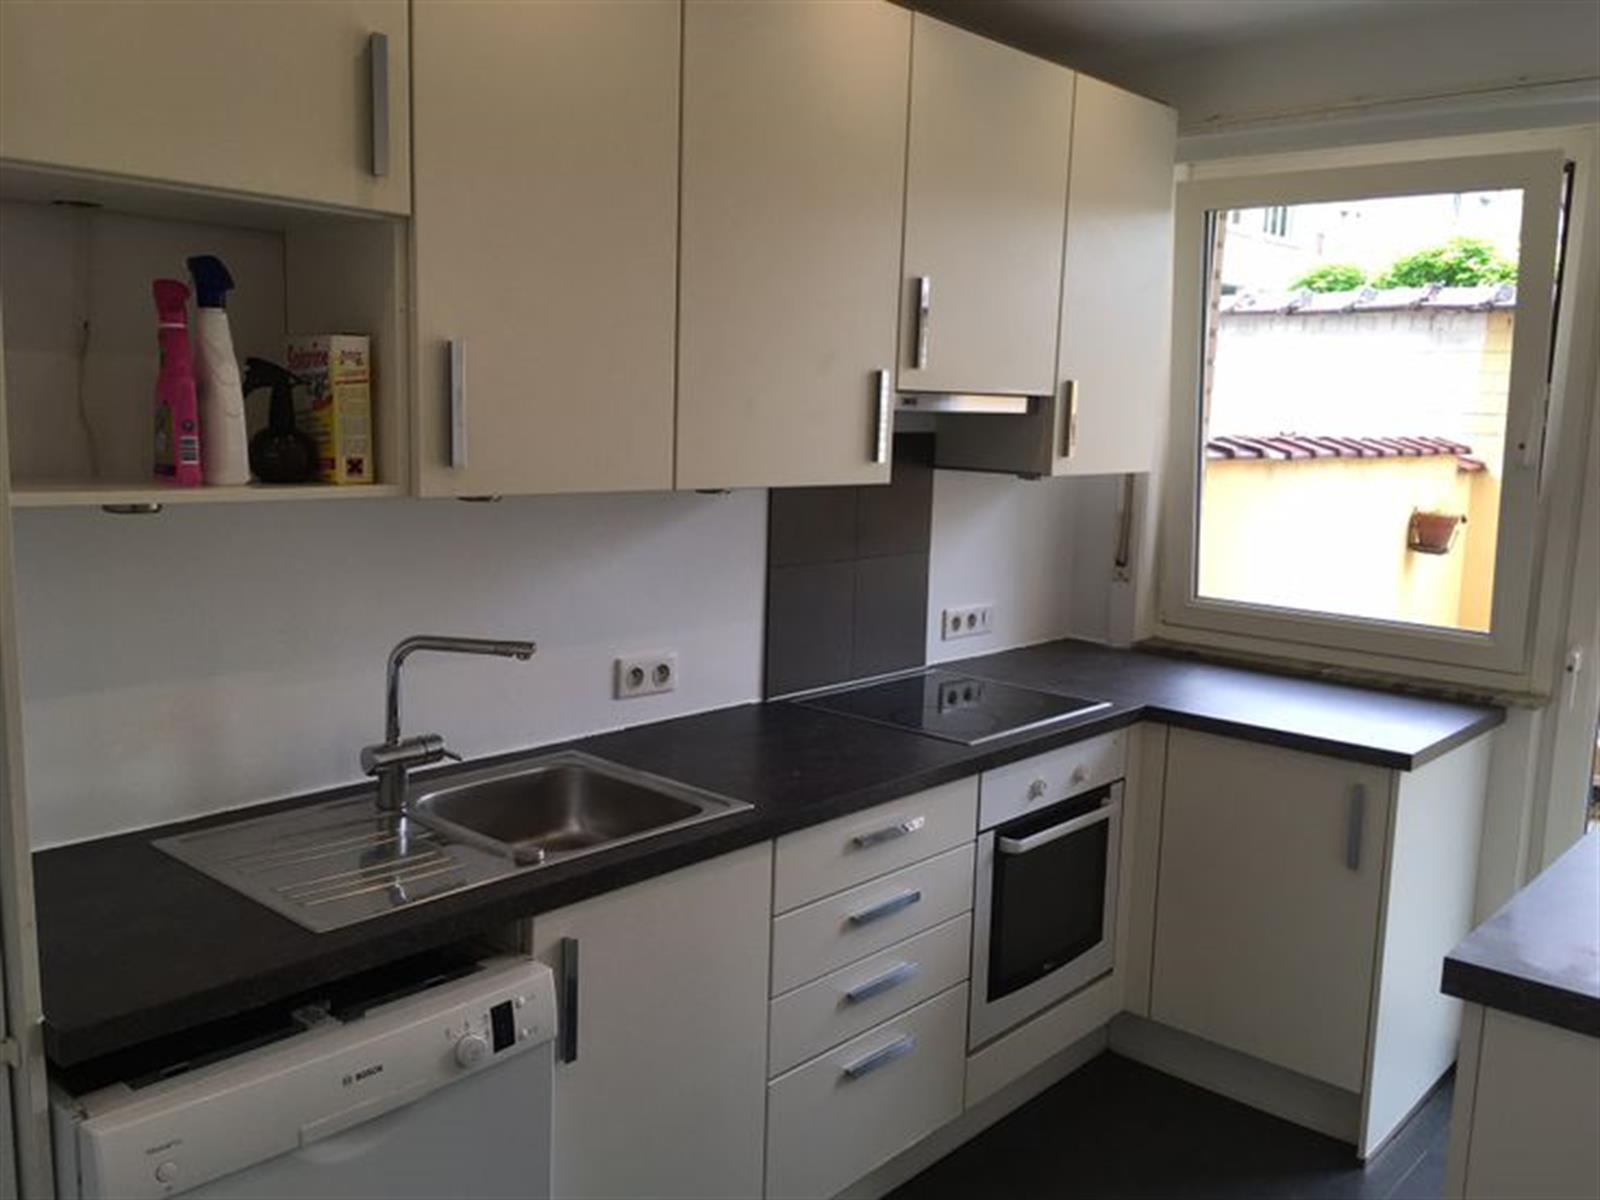 Appartement - Woluwe-Saint-Lambert - #4403252-5